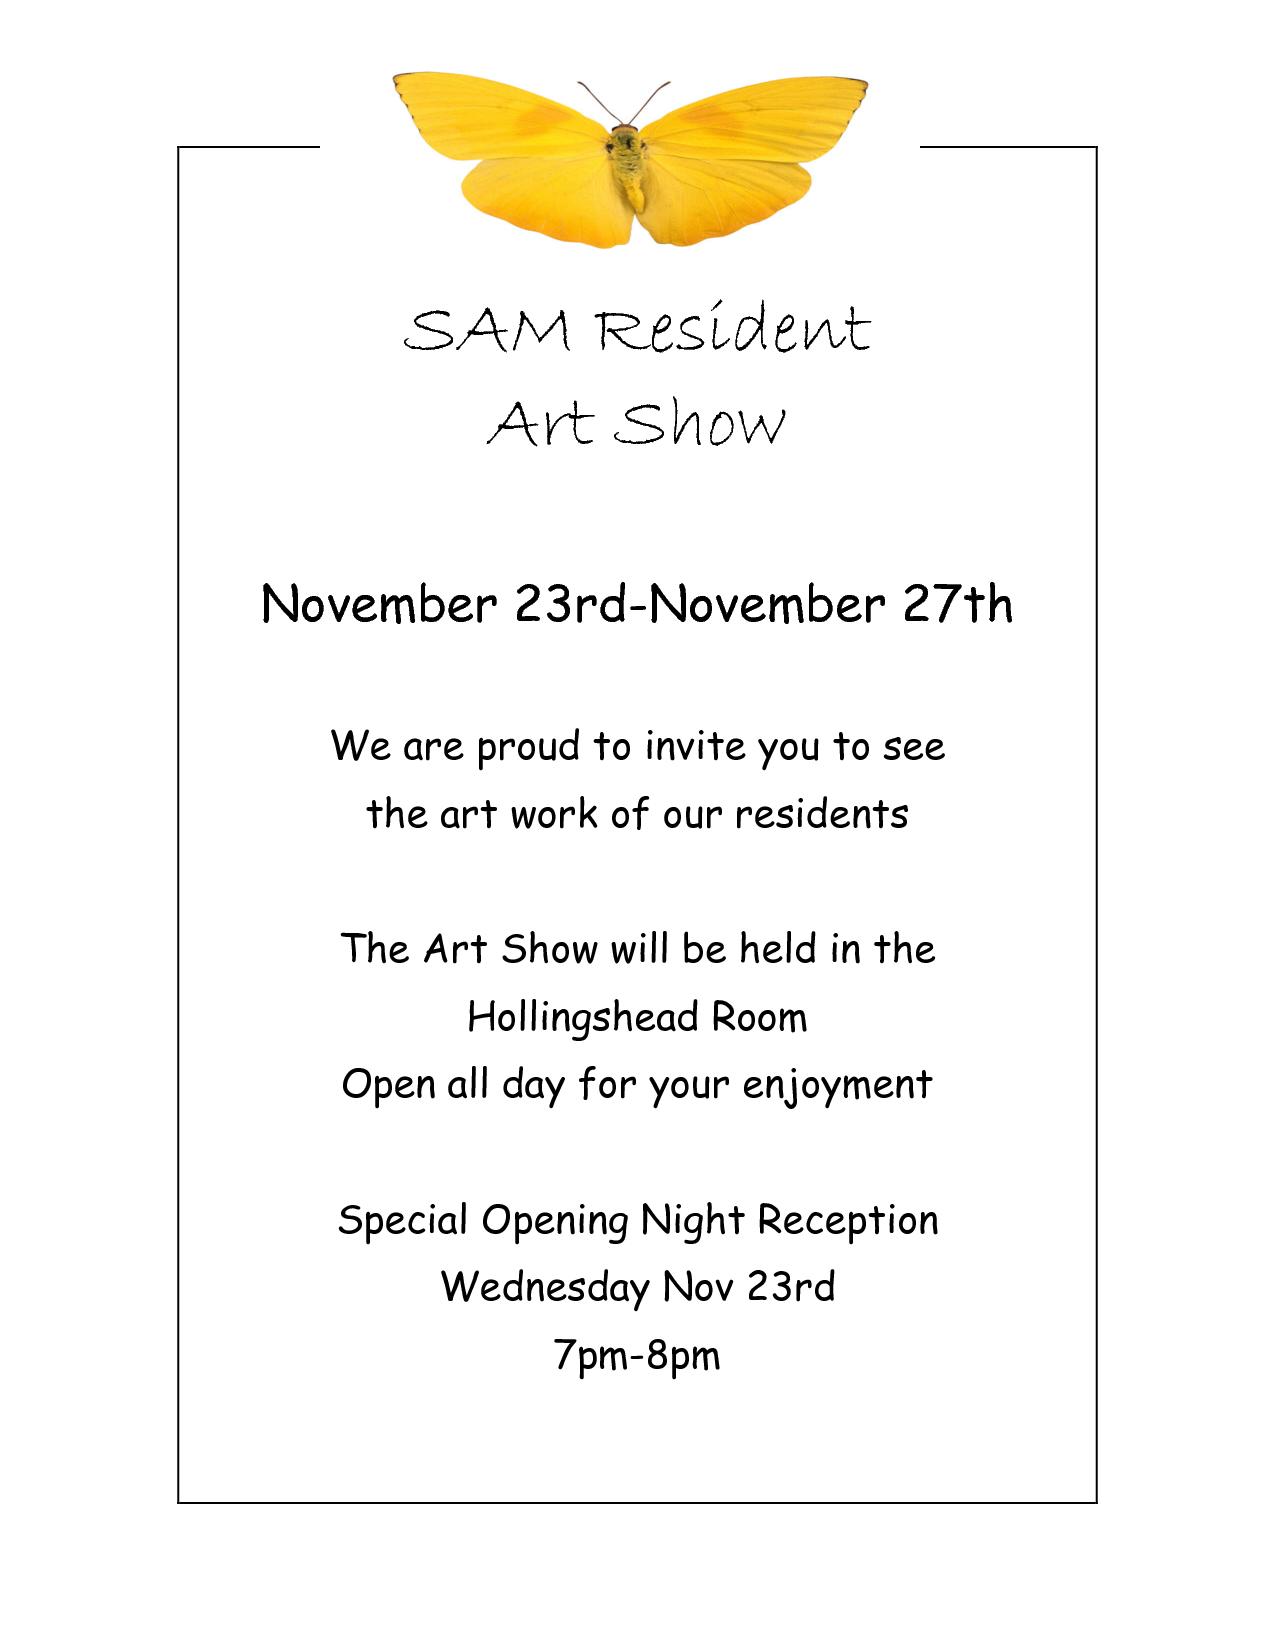 Gallery opening invitation sample invitationswedd art exhibition invites samples google search invitation ideas stopboris Image collections